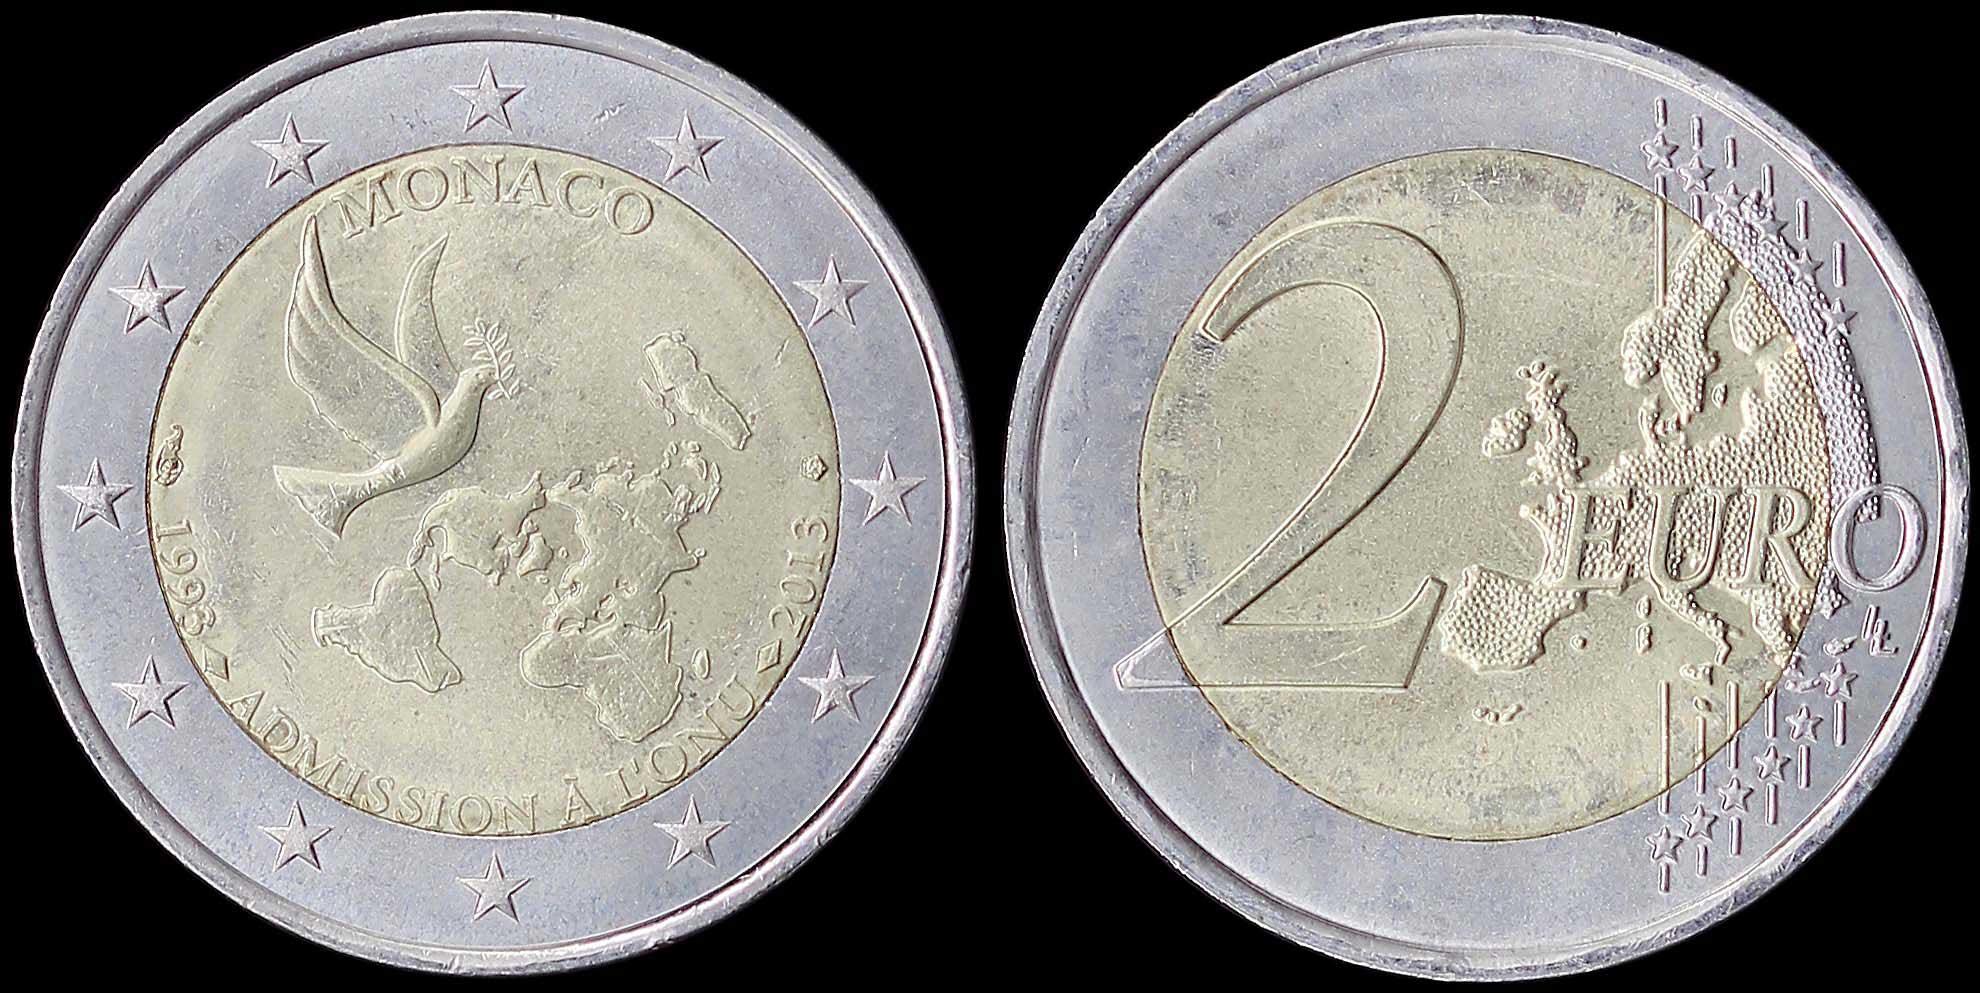 Lot 6986 - -  COINS & TOKENS COINS & TOKENS OF EUROPEAN COUNTRIES -  A. Karamitsos Postal & Live Internet Auction 984 (Part B)